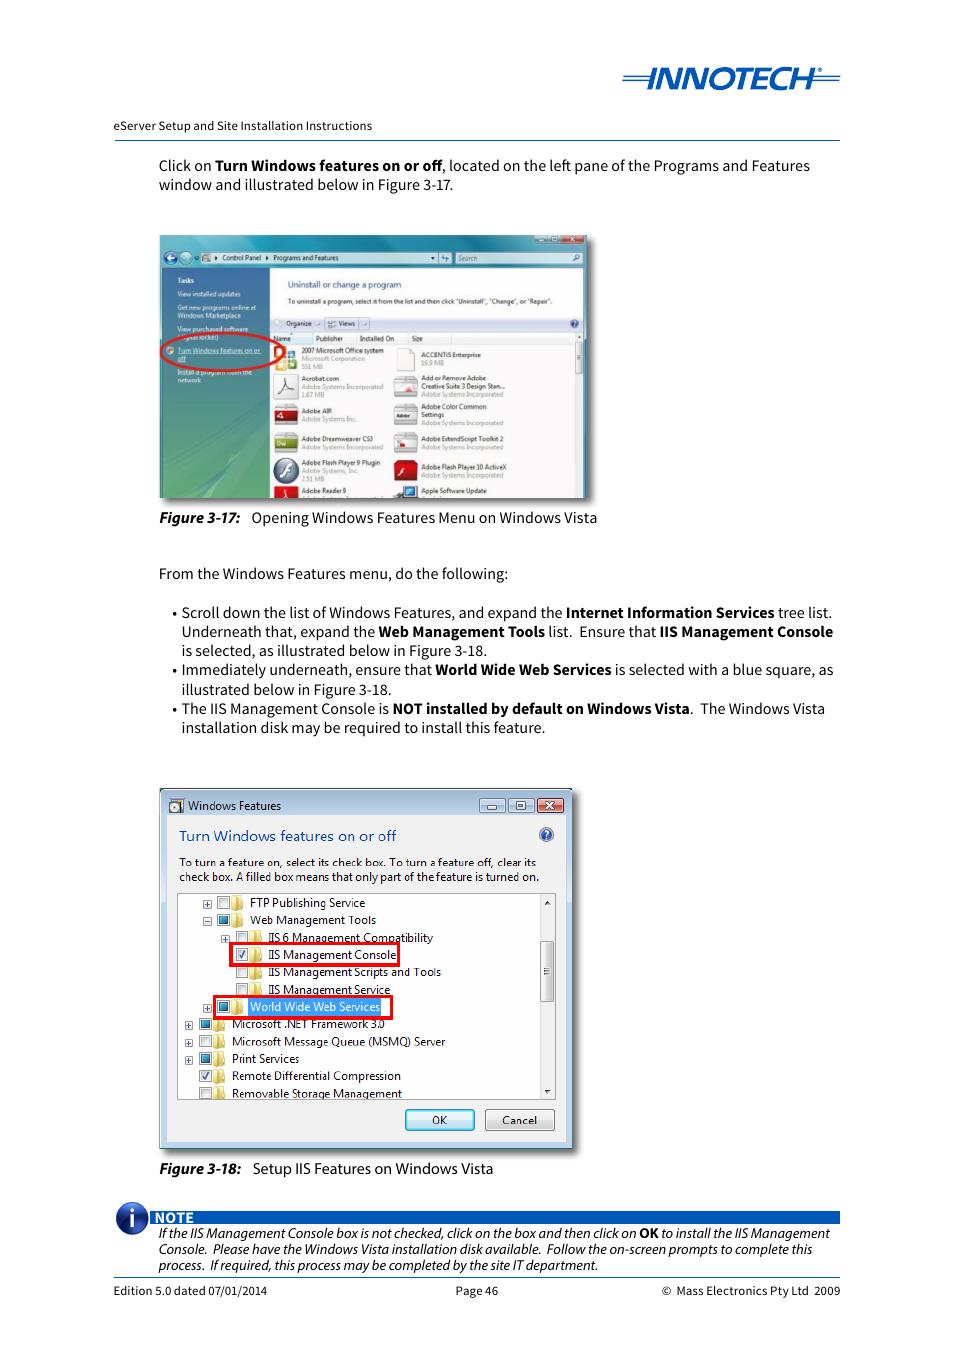 opening windows features menu on windows vista setup iis features rh manualsdir com windows vista user manual pdf User Manual PDF